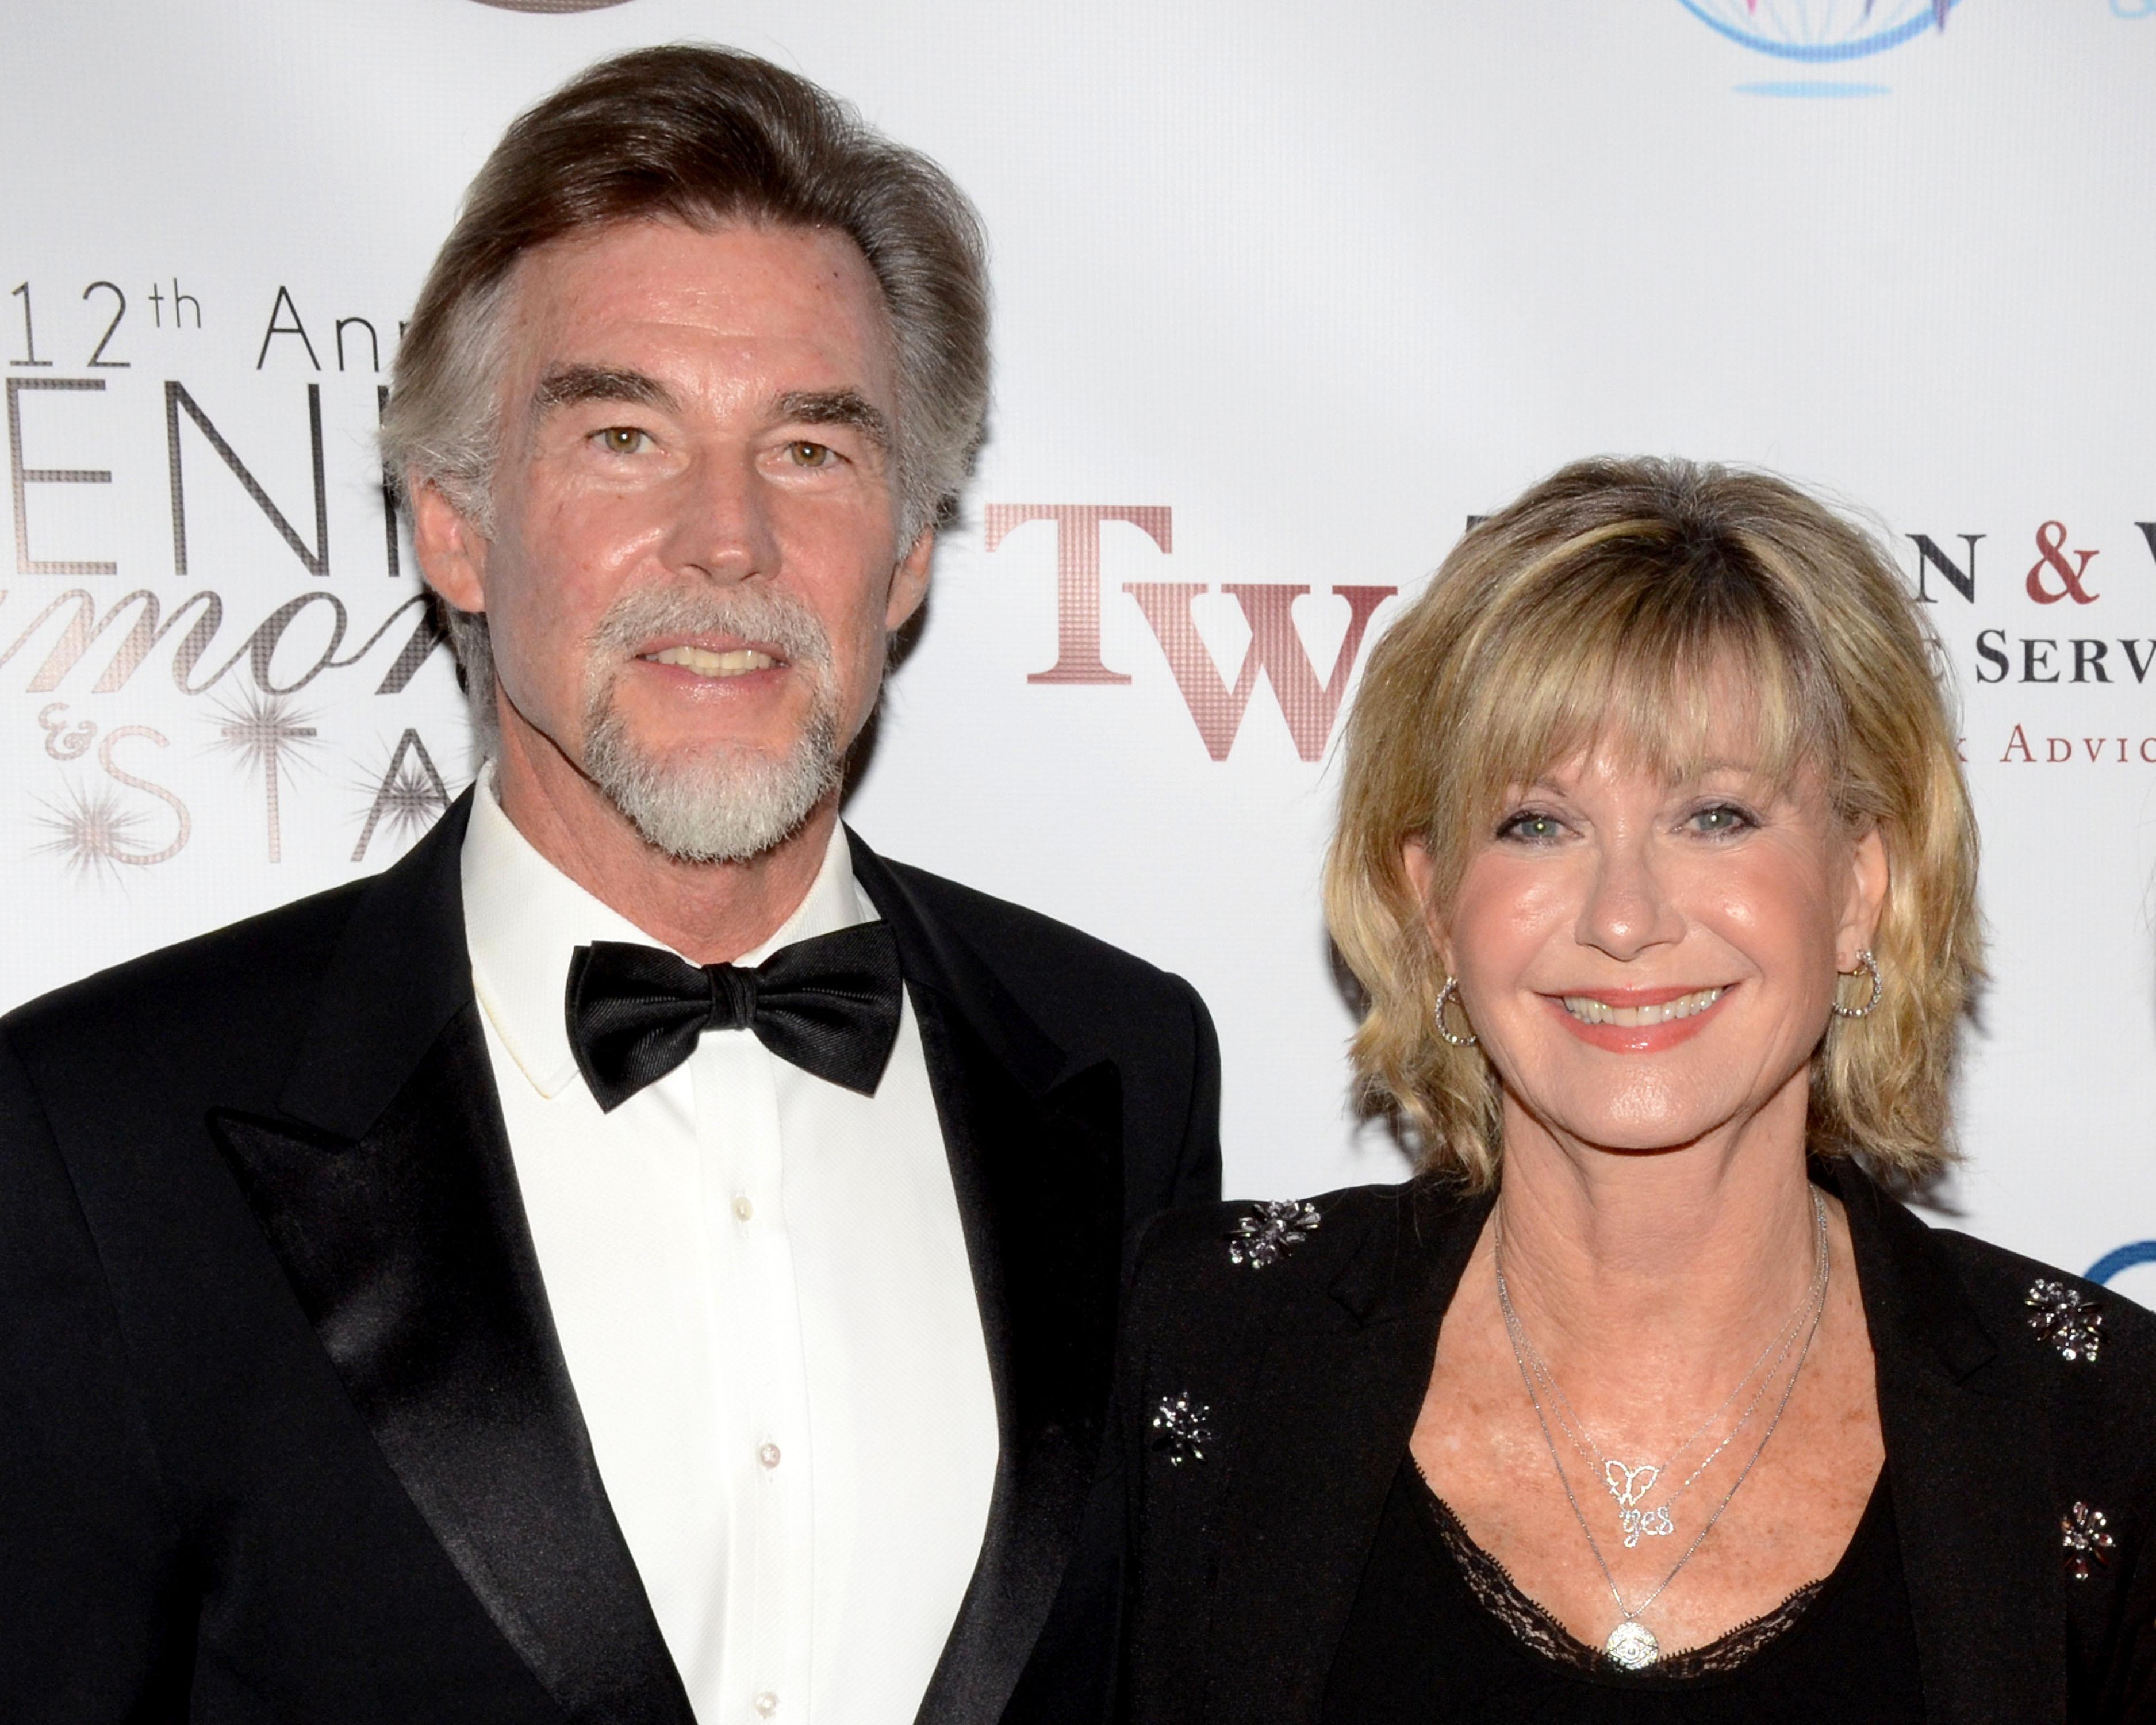 Olivia and her husband John Easterling. Credit: PA Images